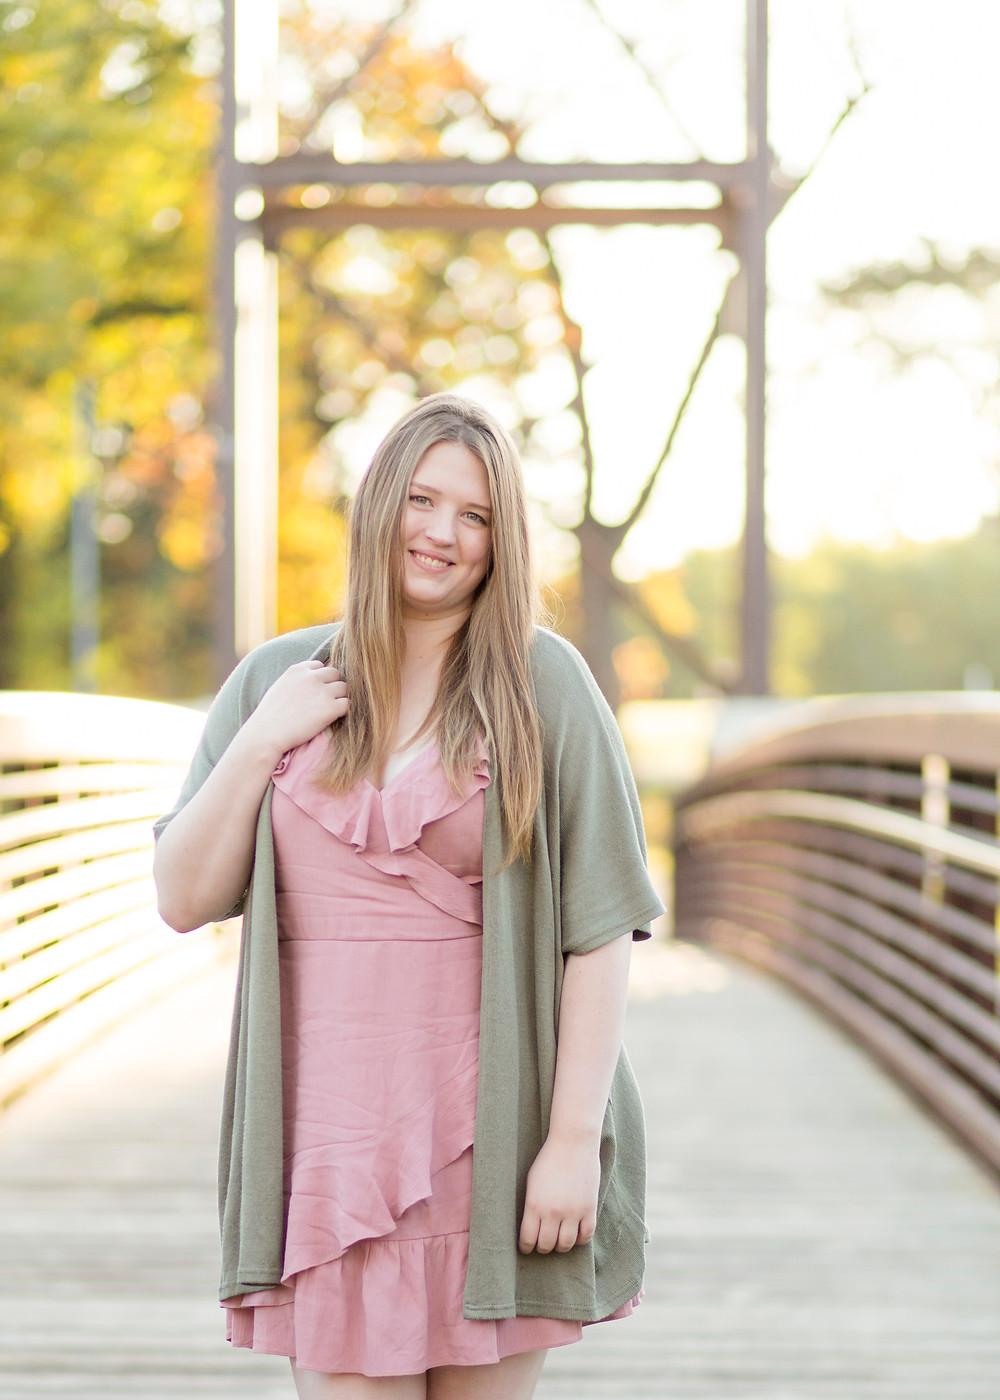 Girl Senior Graduation Photos